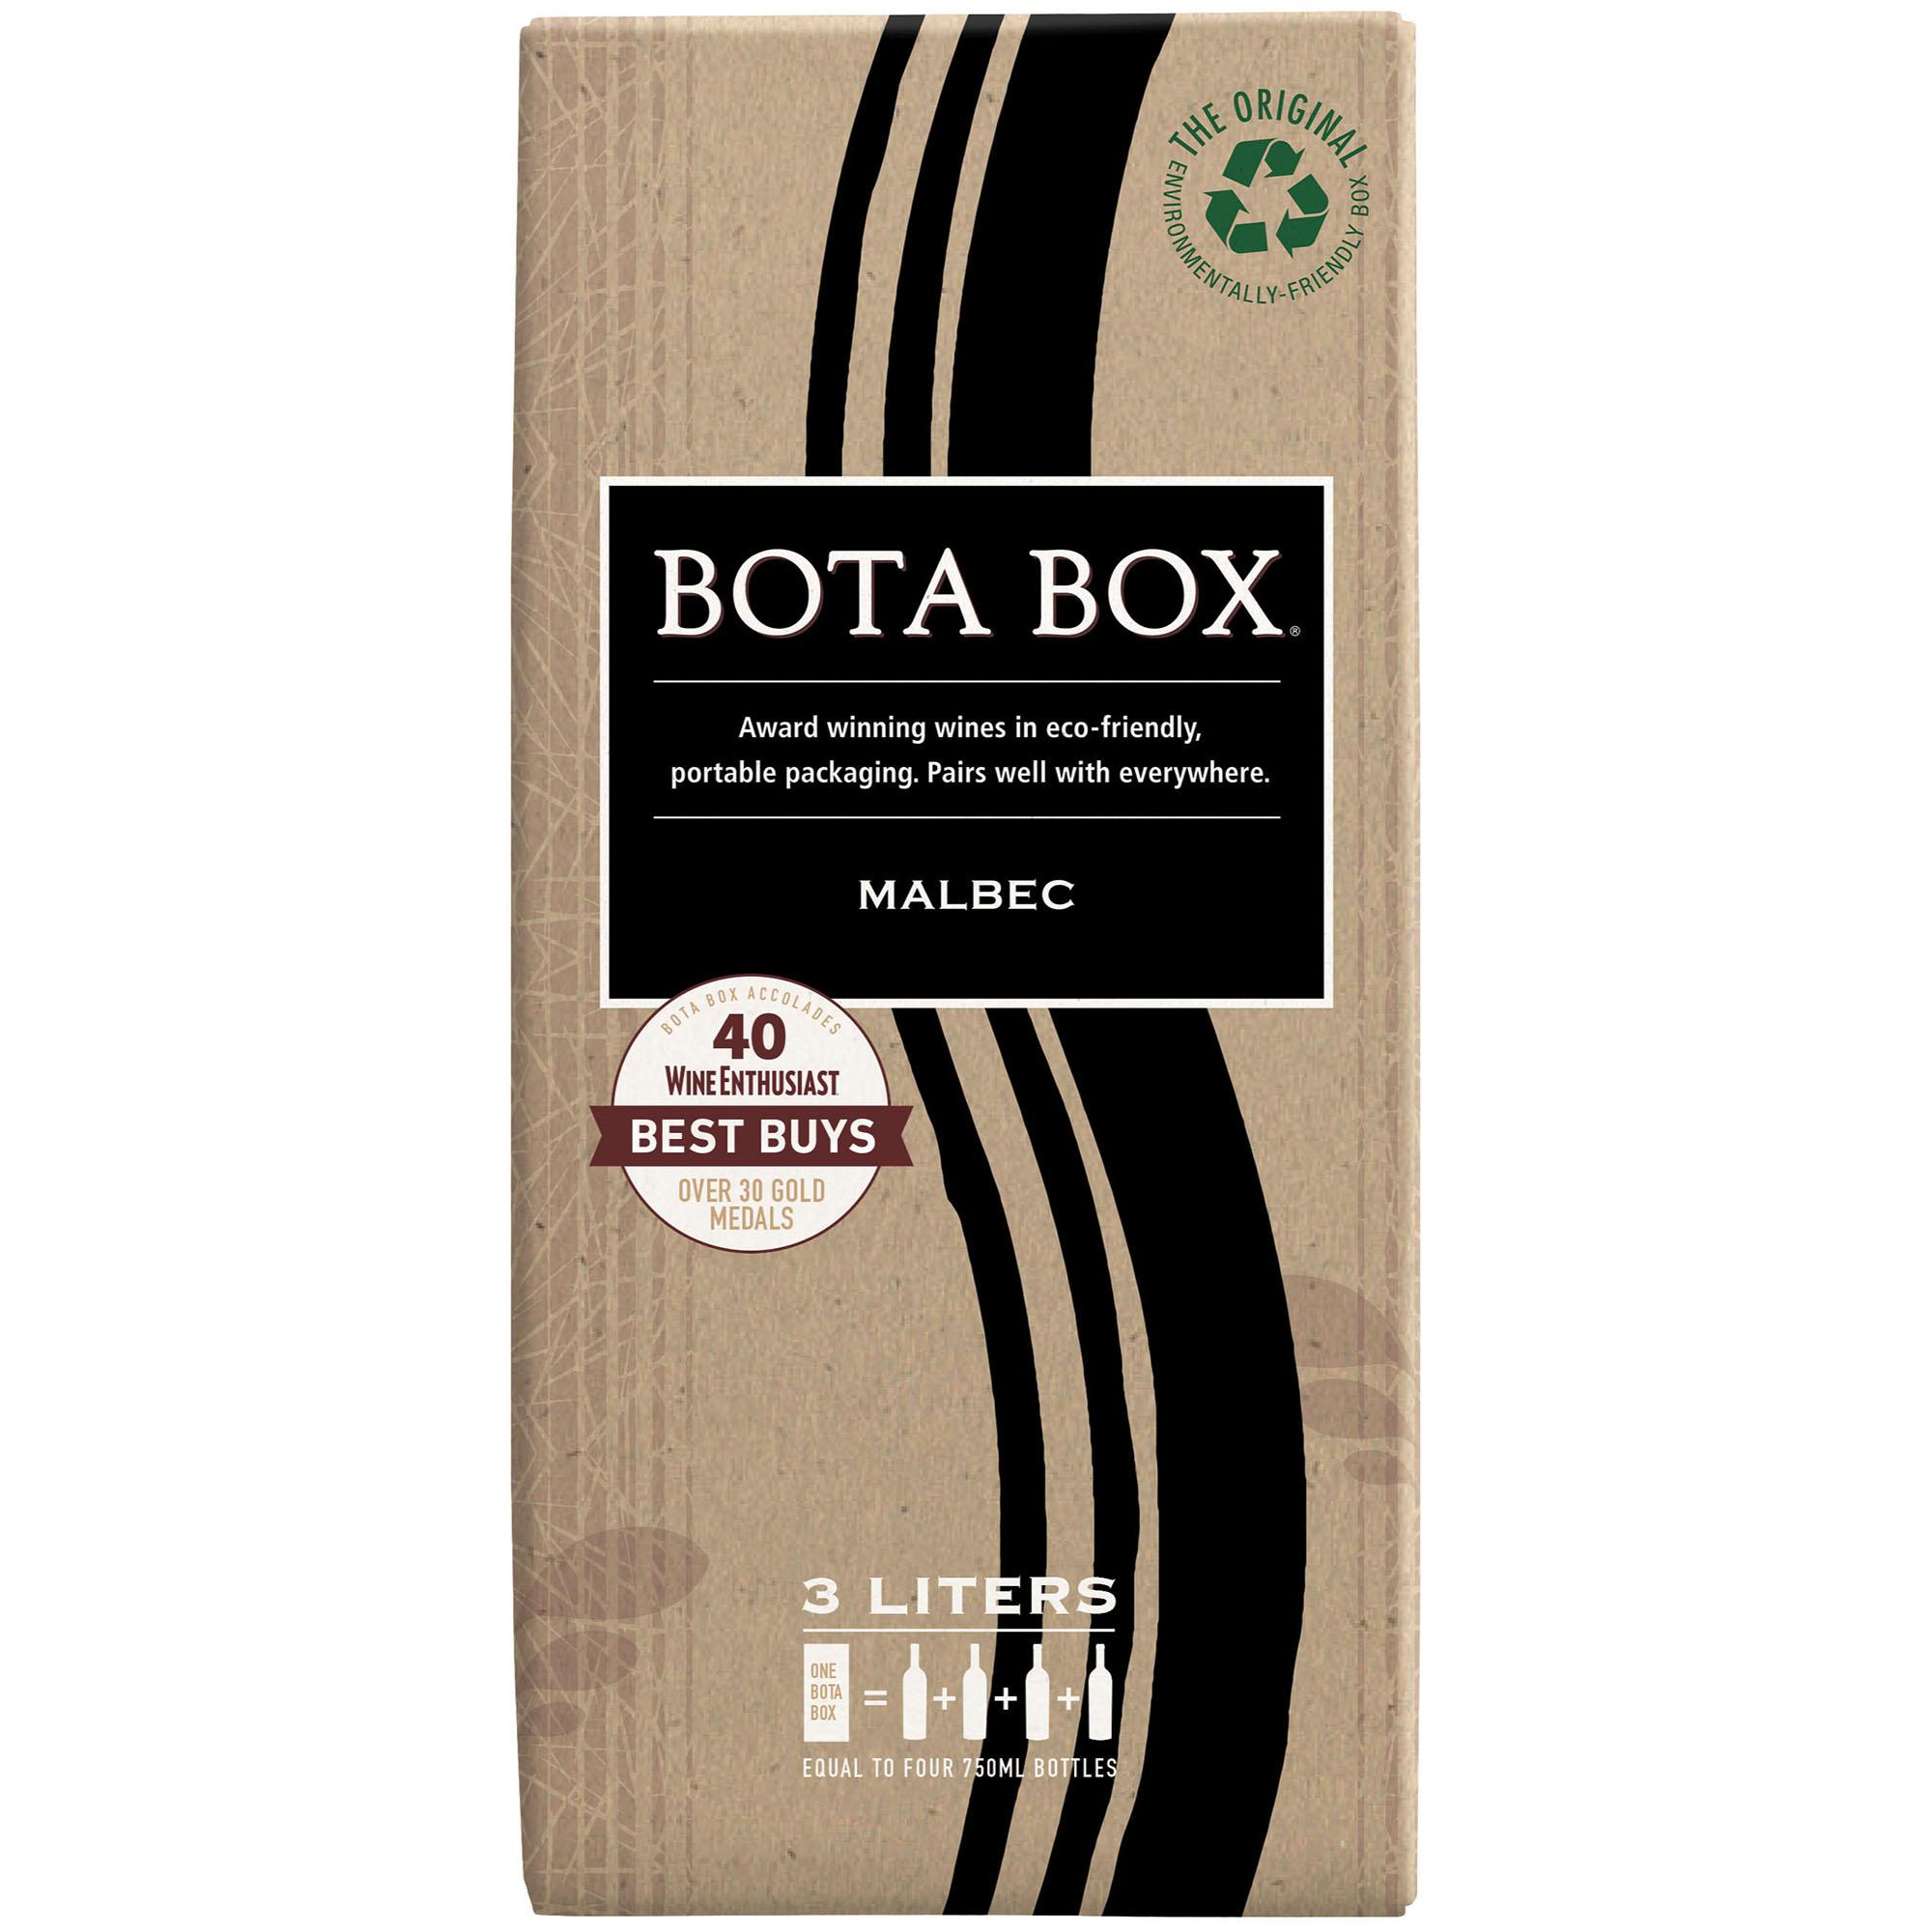 Bota Box Malbec 3L NV